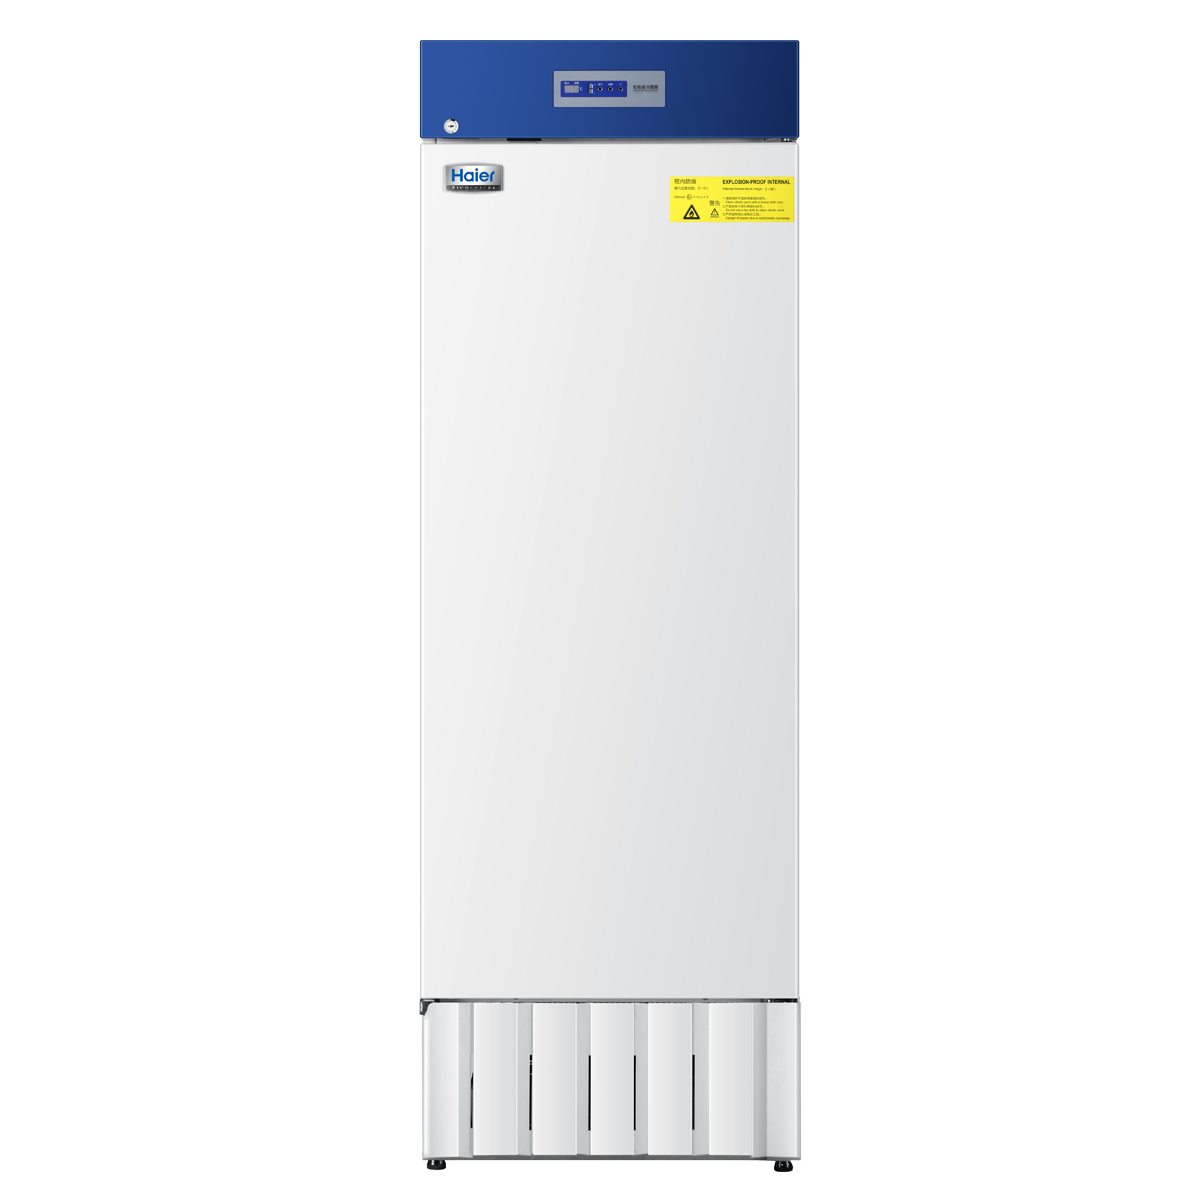 海尔HLR-310FL实验室冰箱